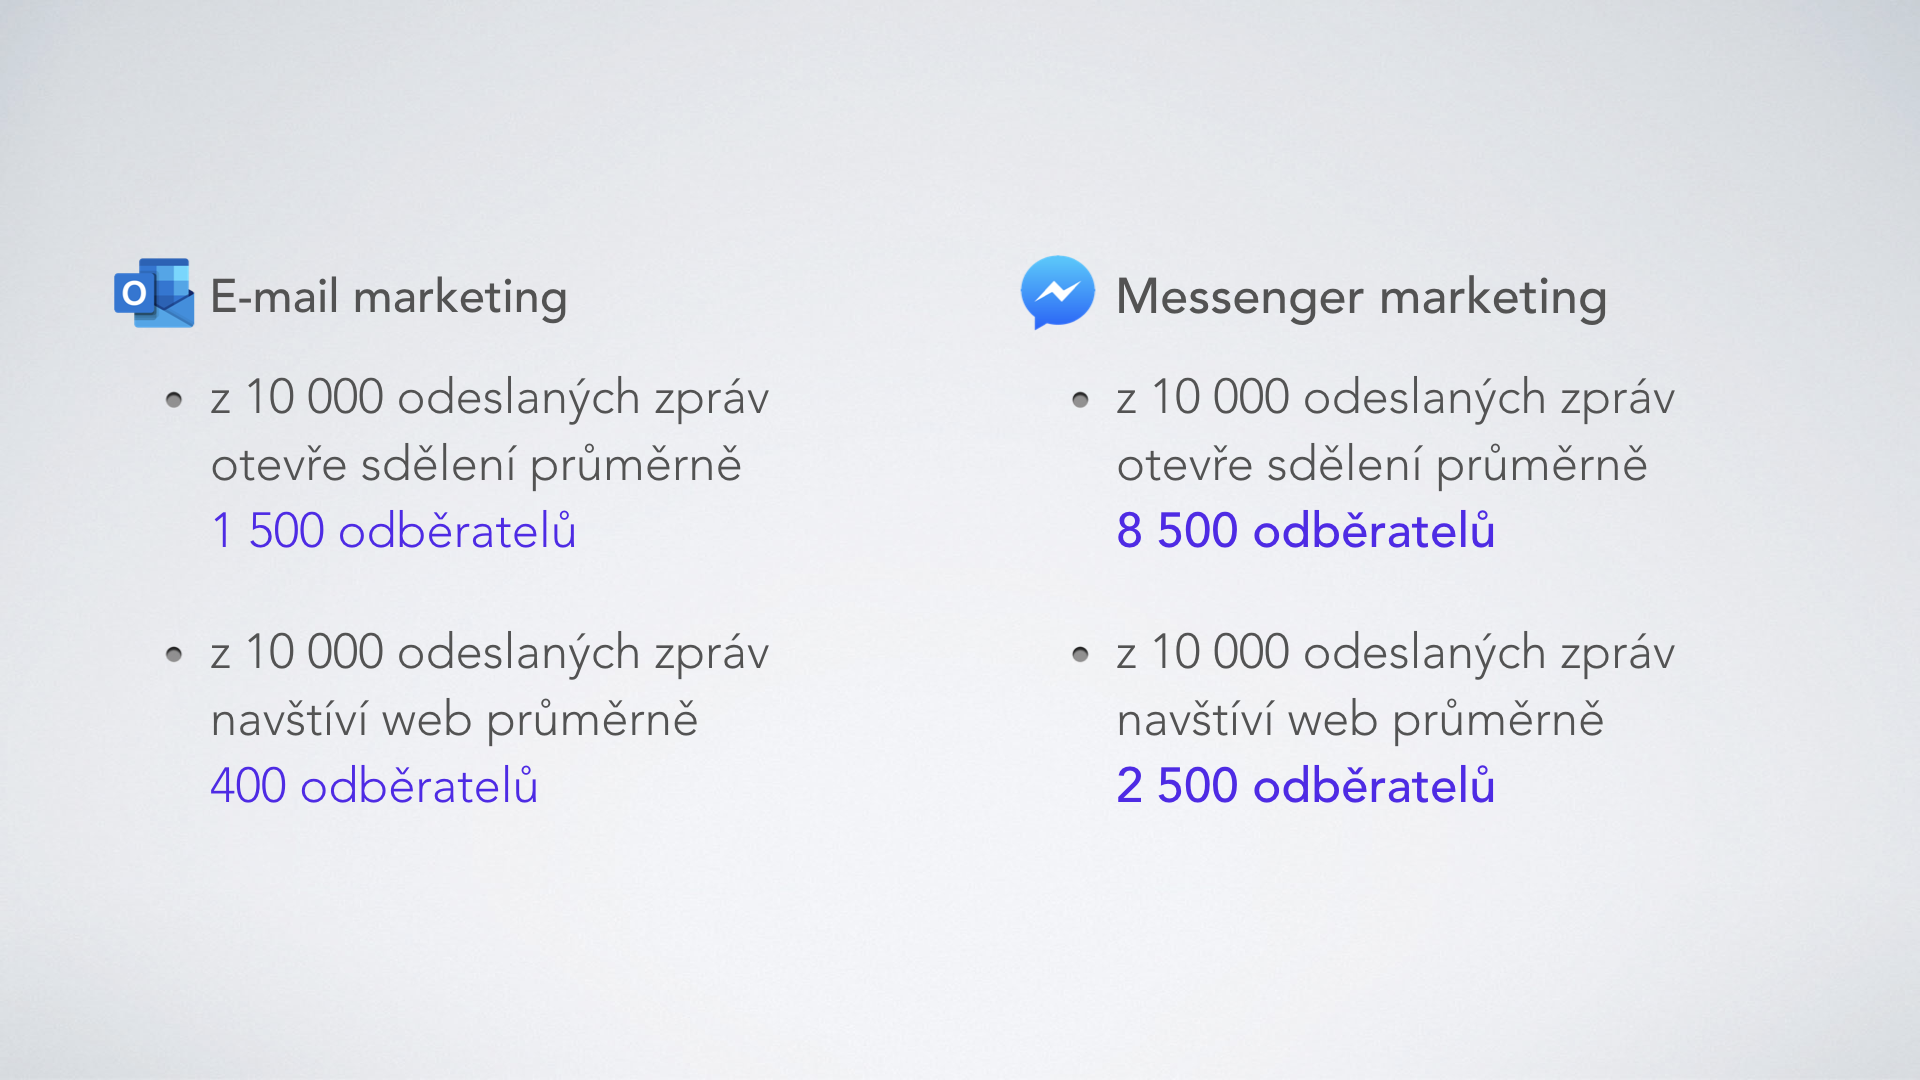 E-mail marketing vs Messenger marketing